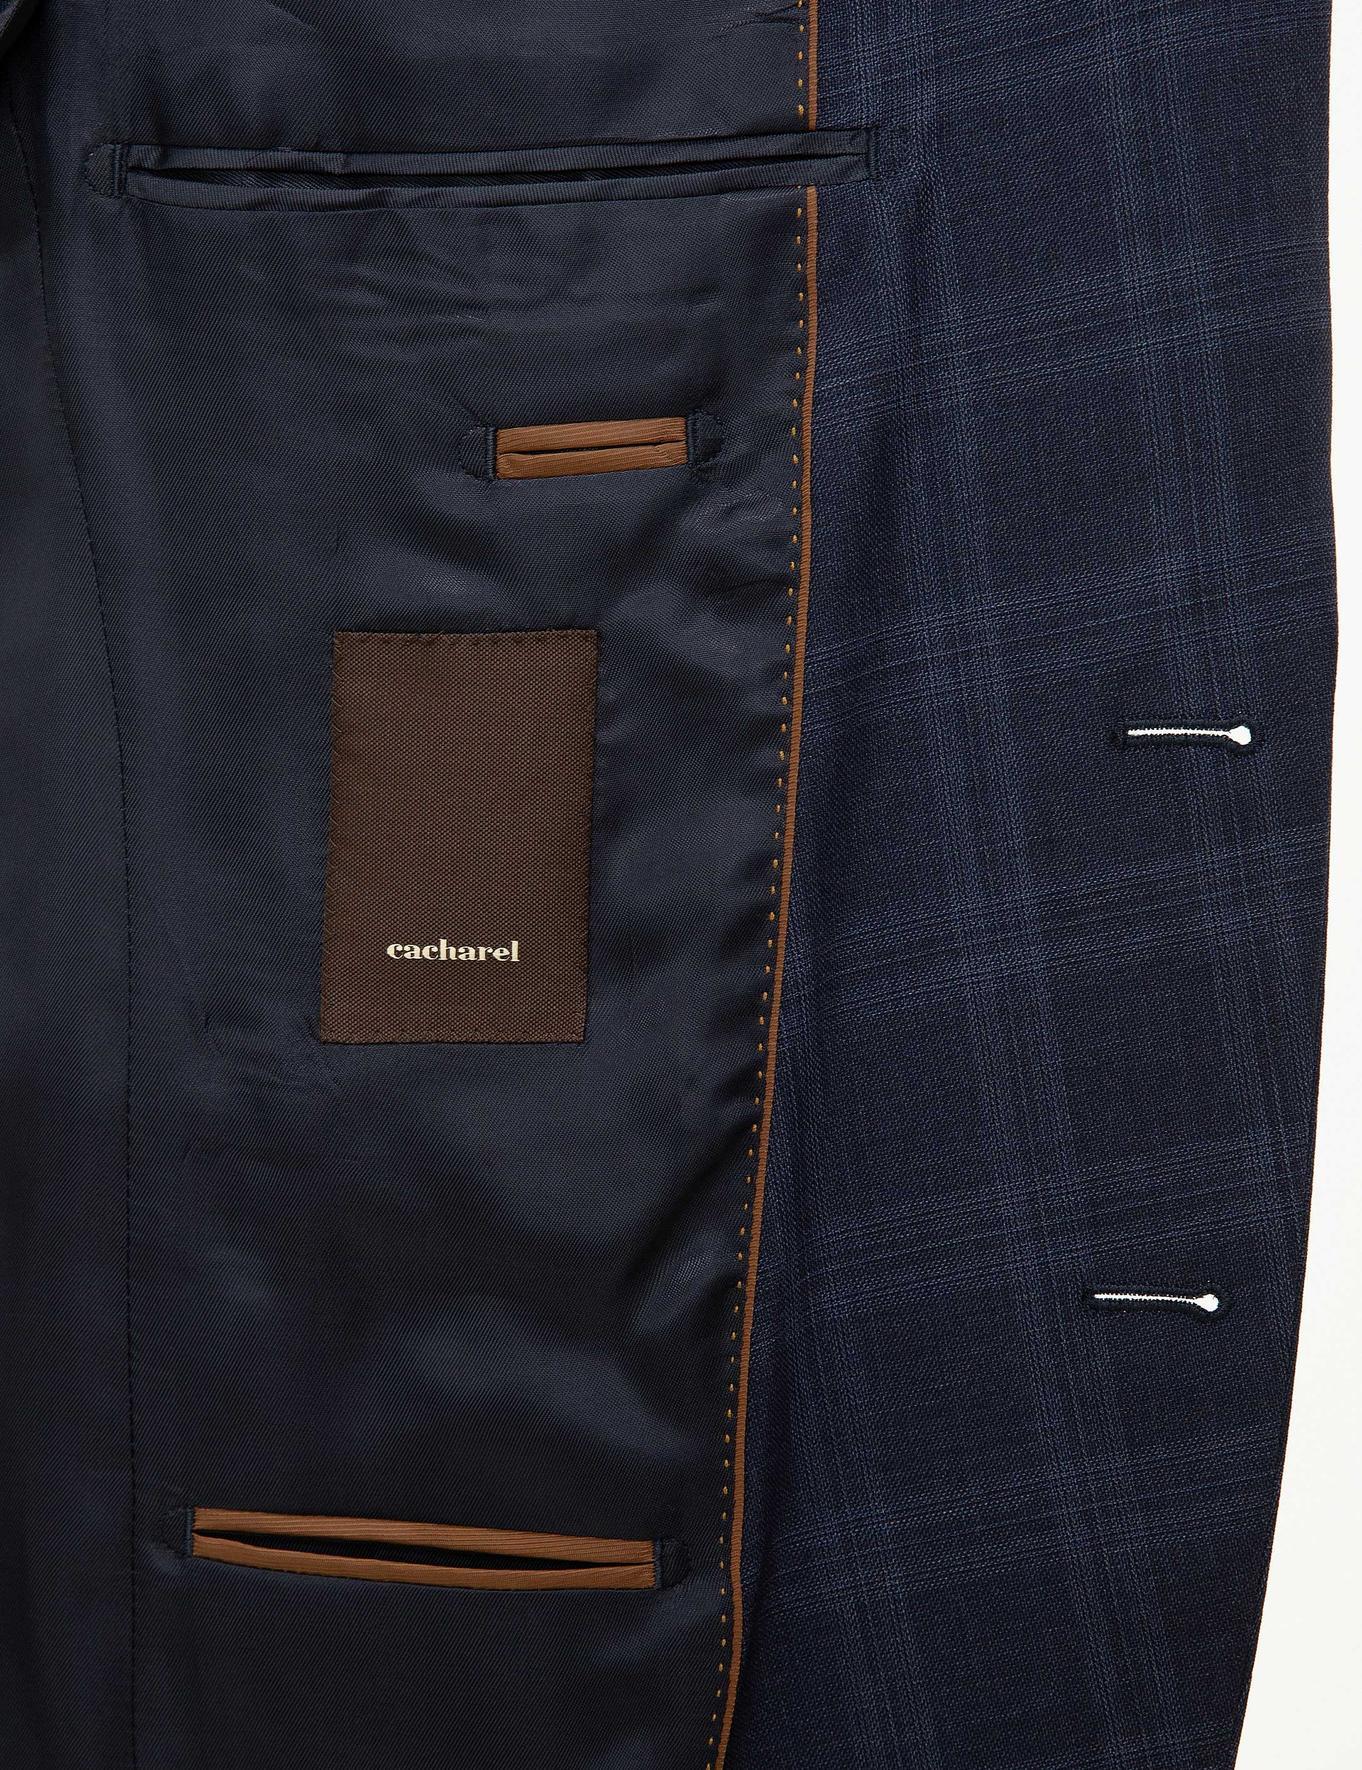 Açık Lacivert Ex. Slim Fit Takım Elbise - 50225488011